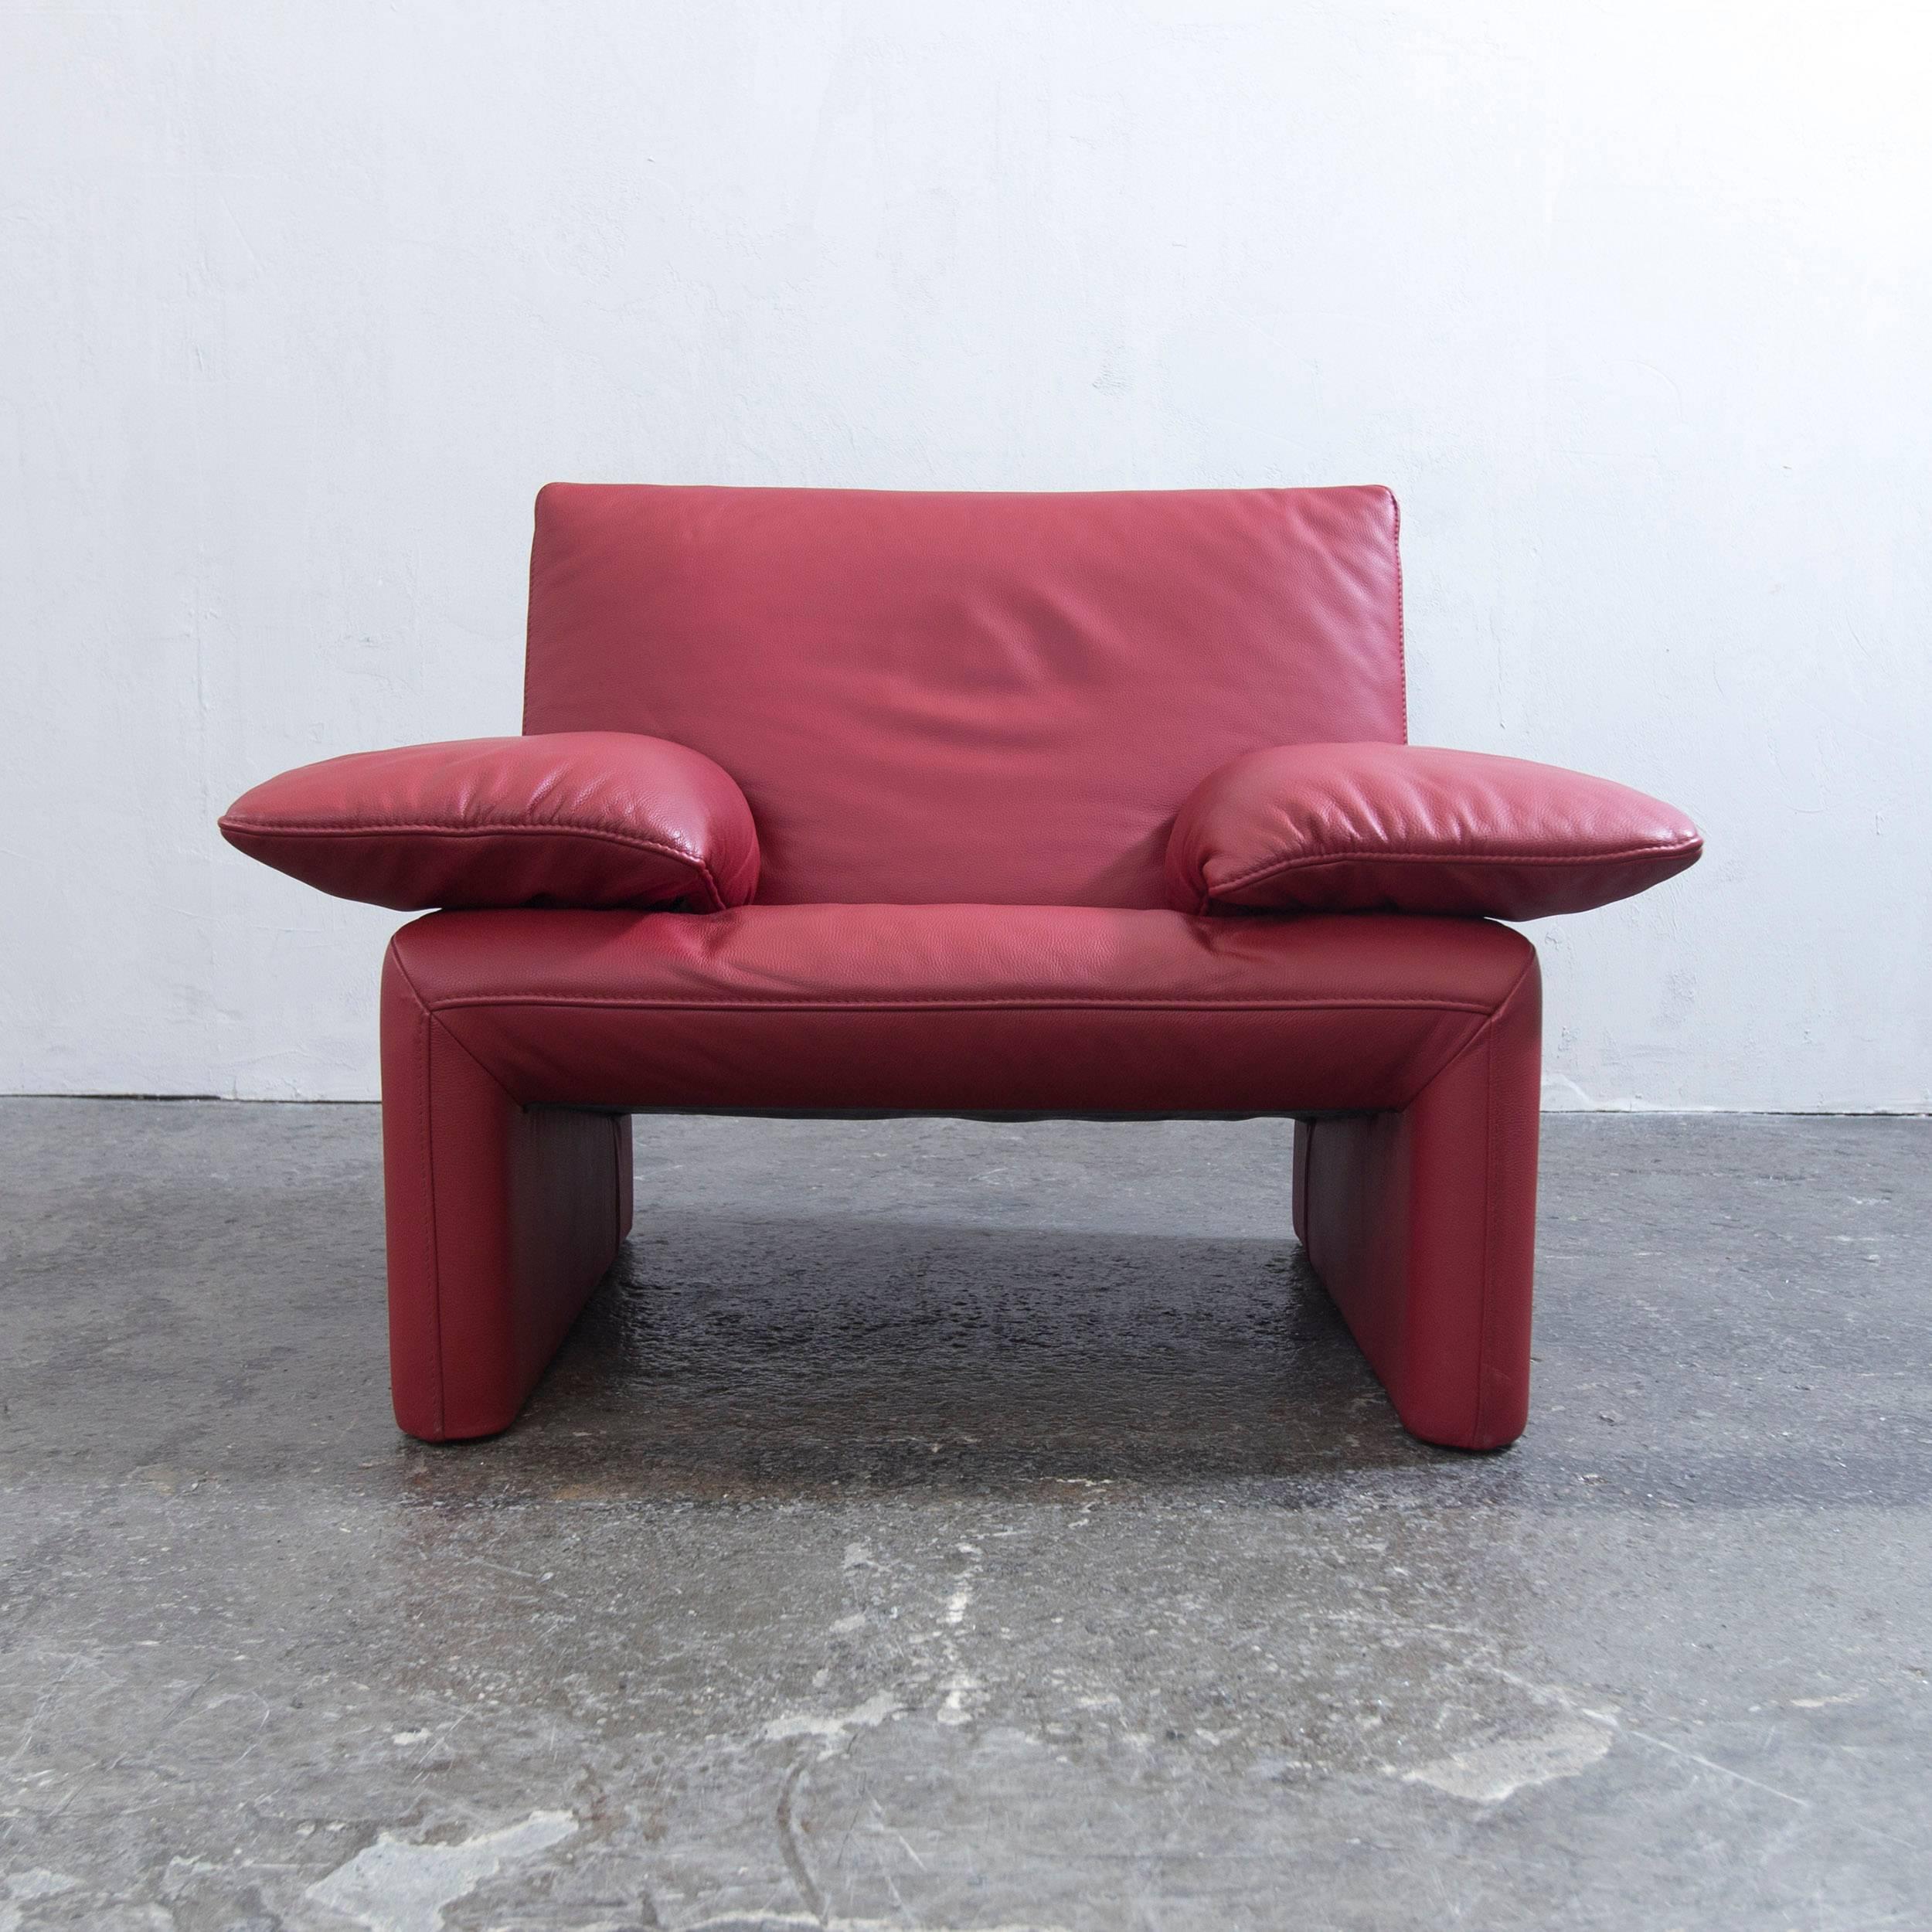 Cool Jori Designer Sessel Rot Leder Einsitzer Couch Funktion Modern Echtleder With